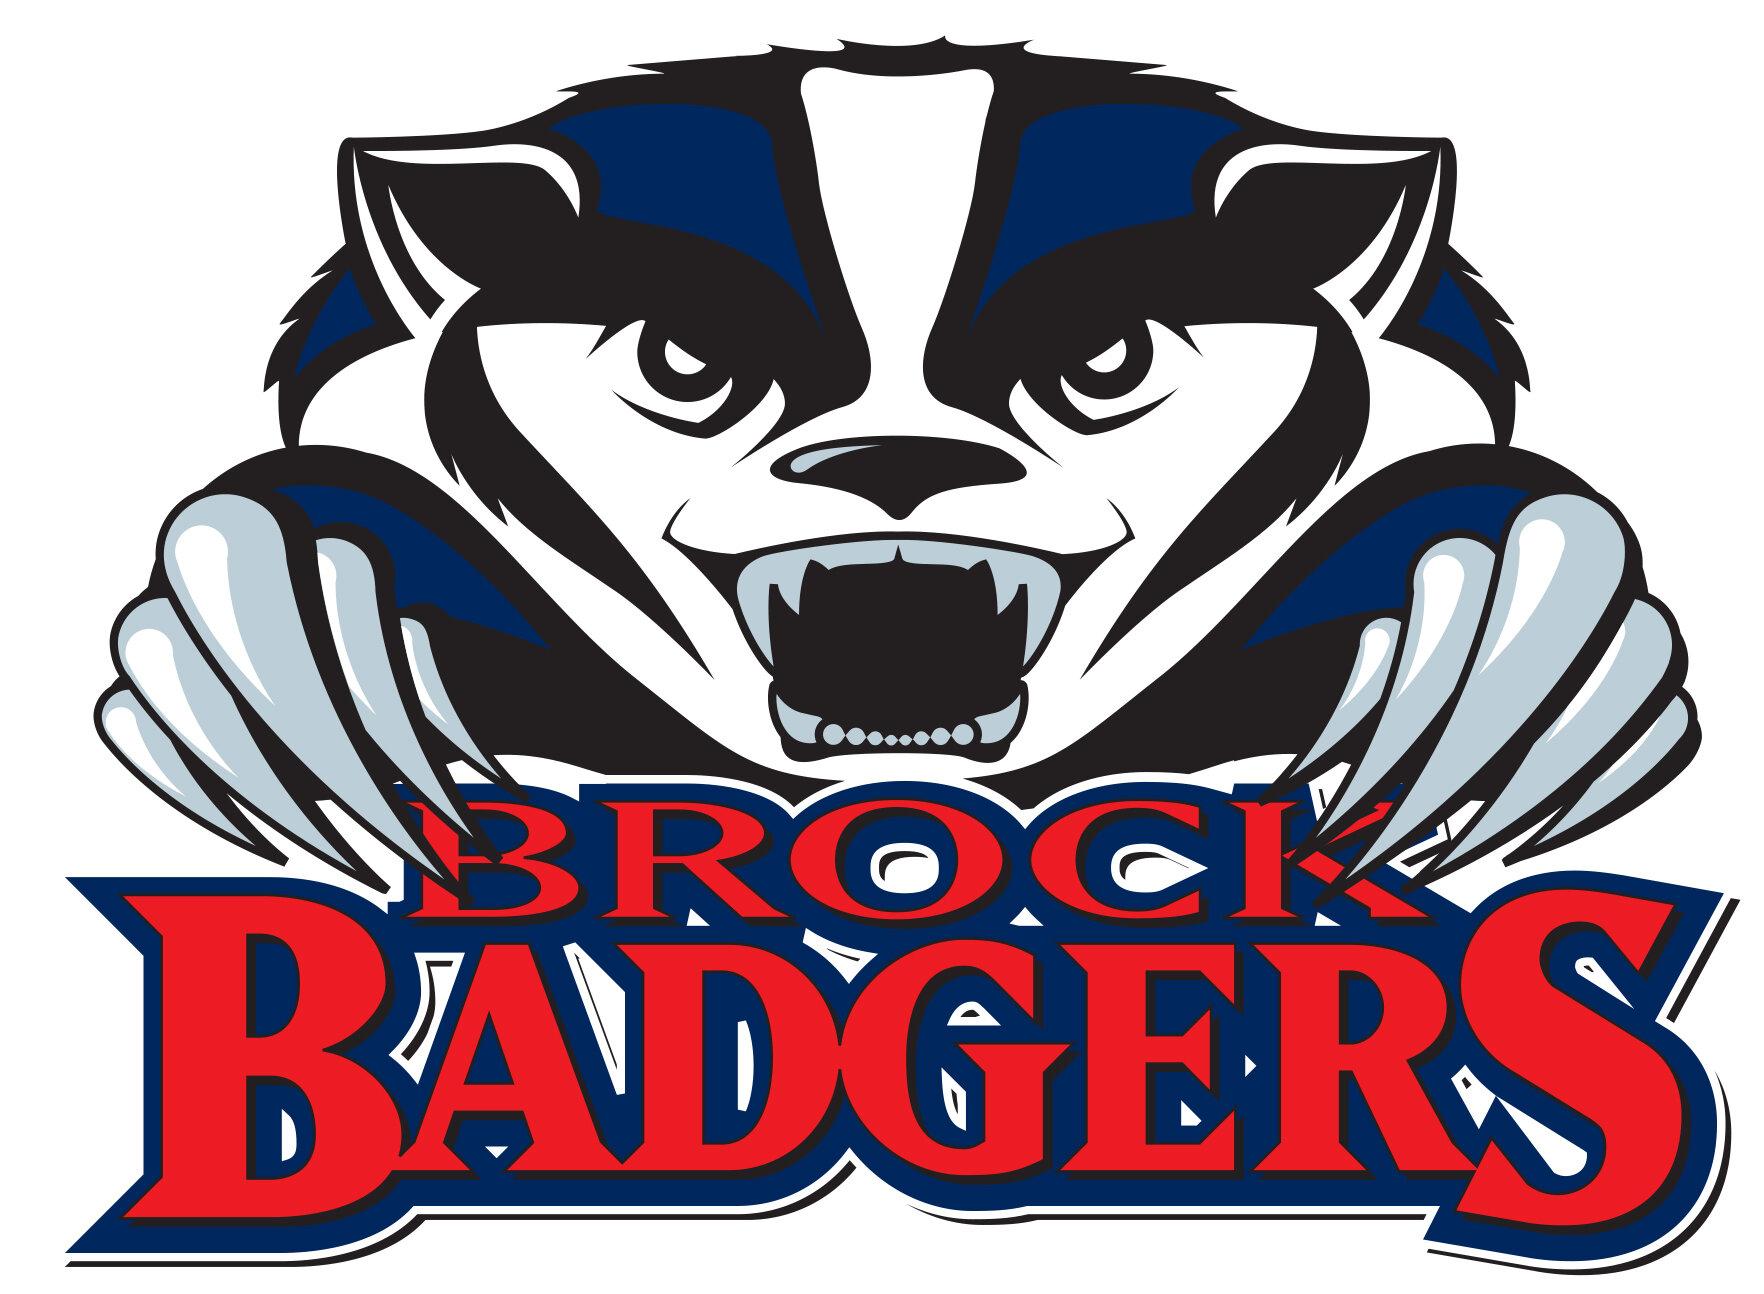 BadgerLogoBrockUniversity.jpg